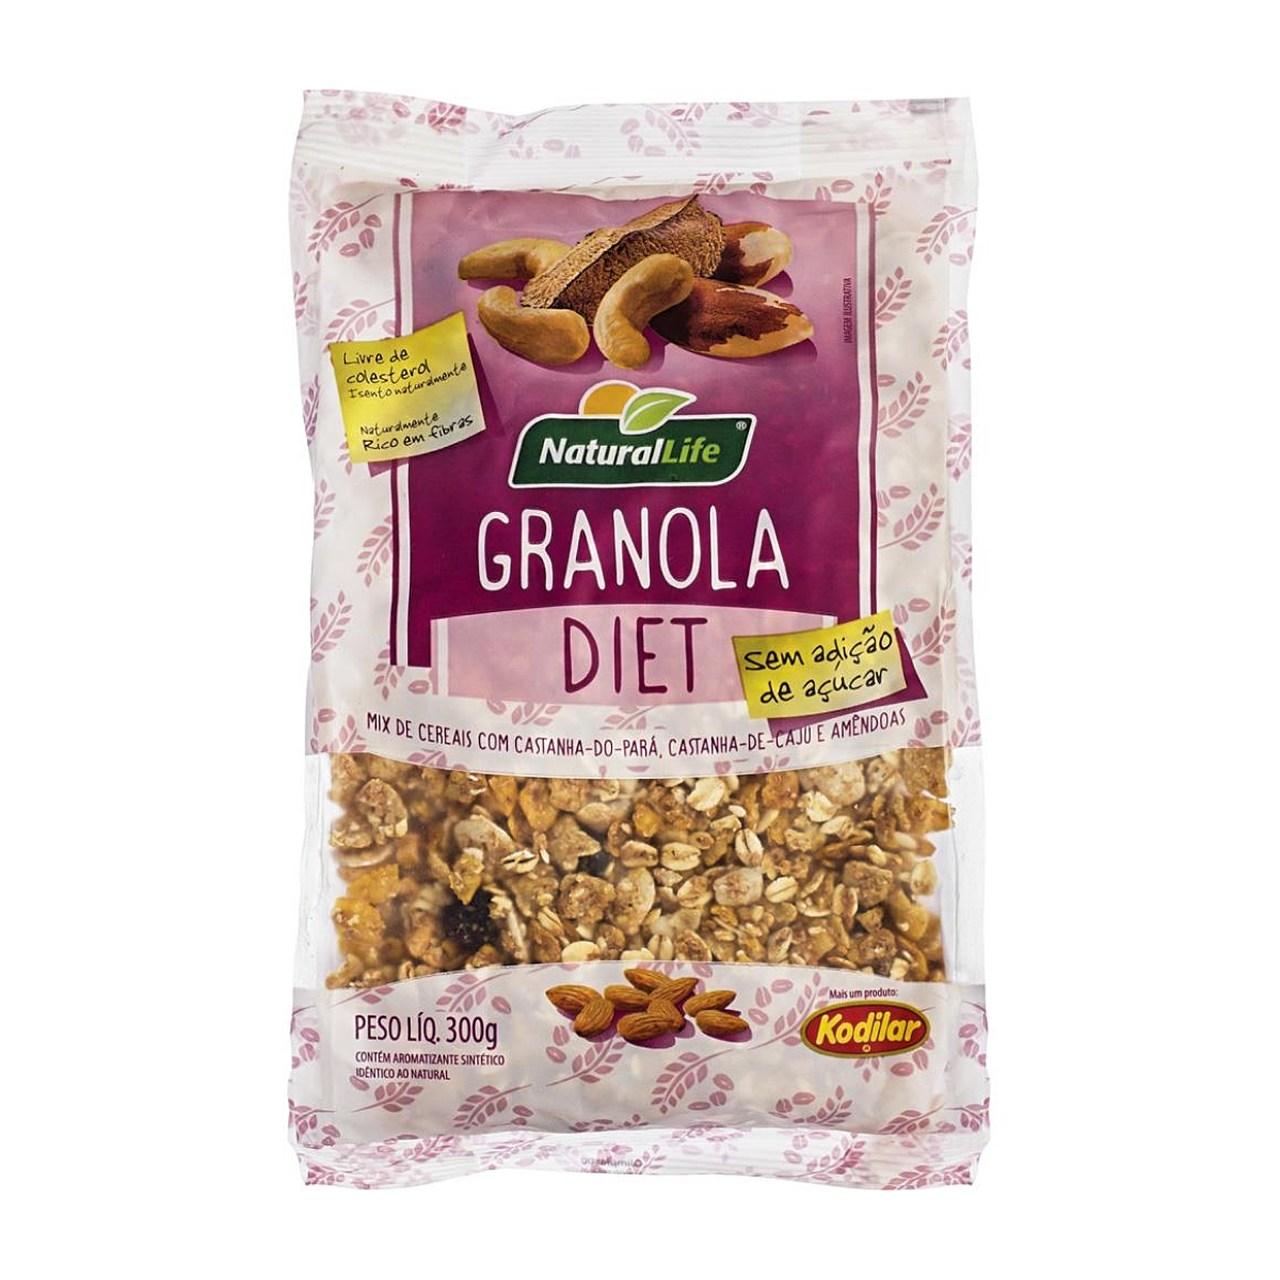 Granola diet 300g - Kodilar